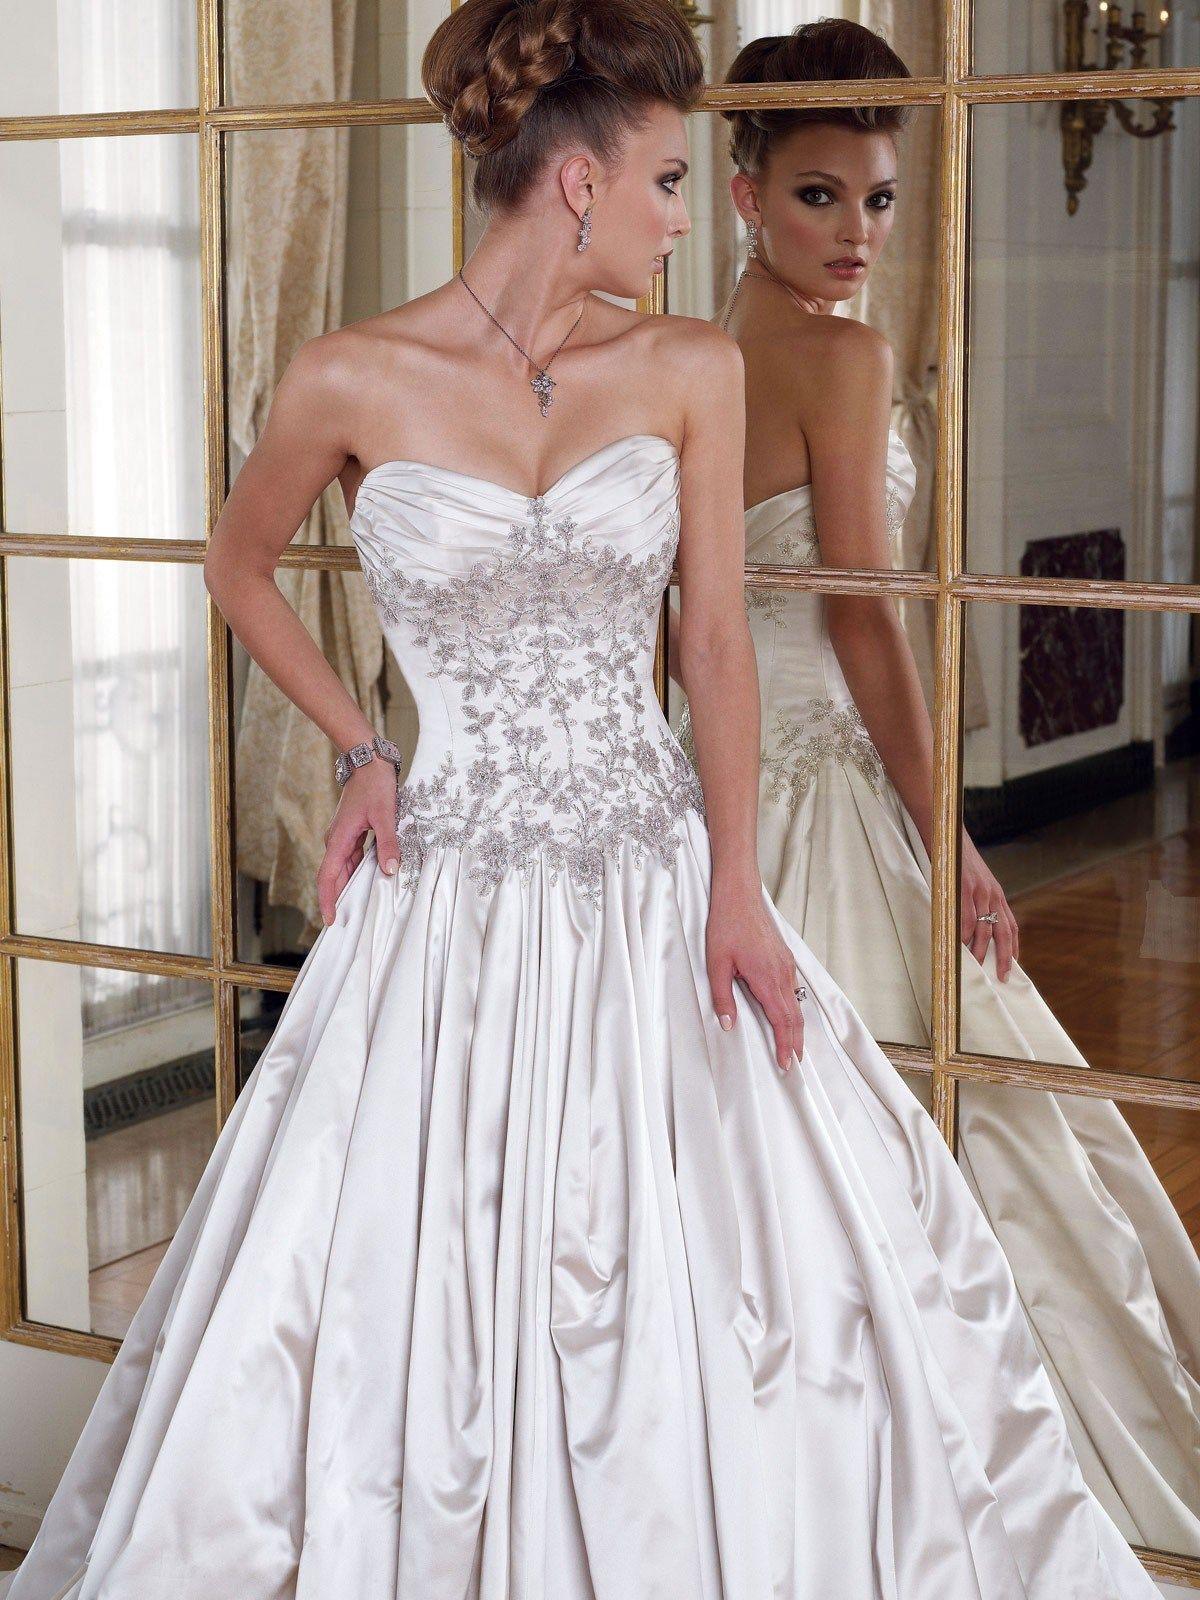 Unique Best Corset For Under Wedding Dress Model